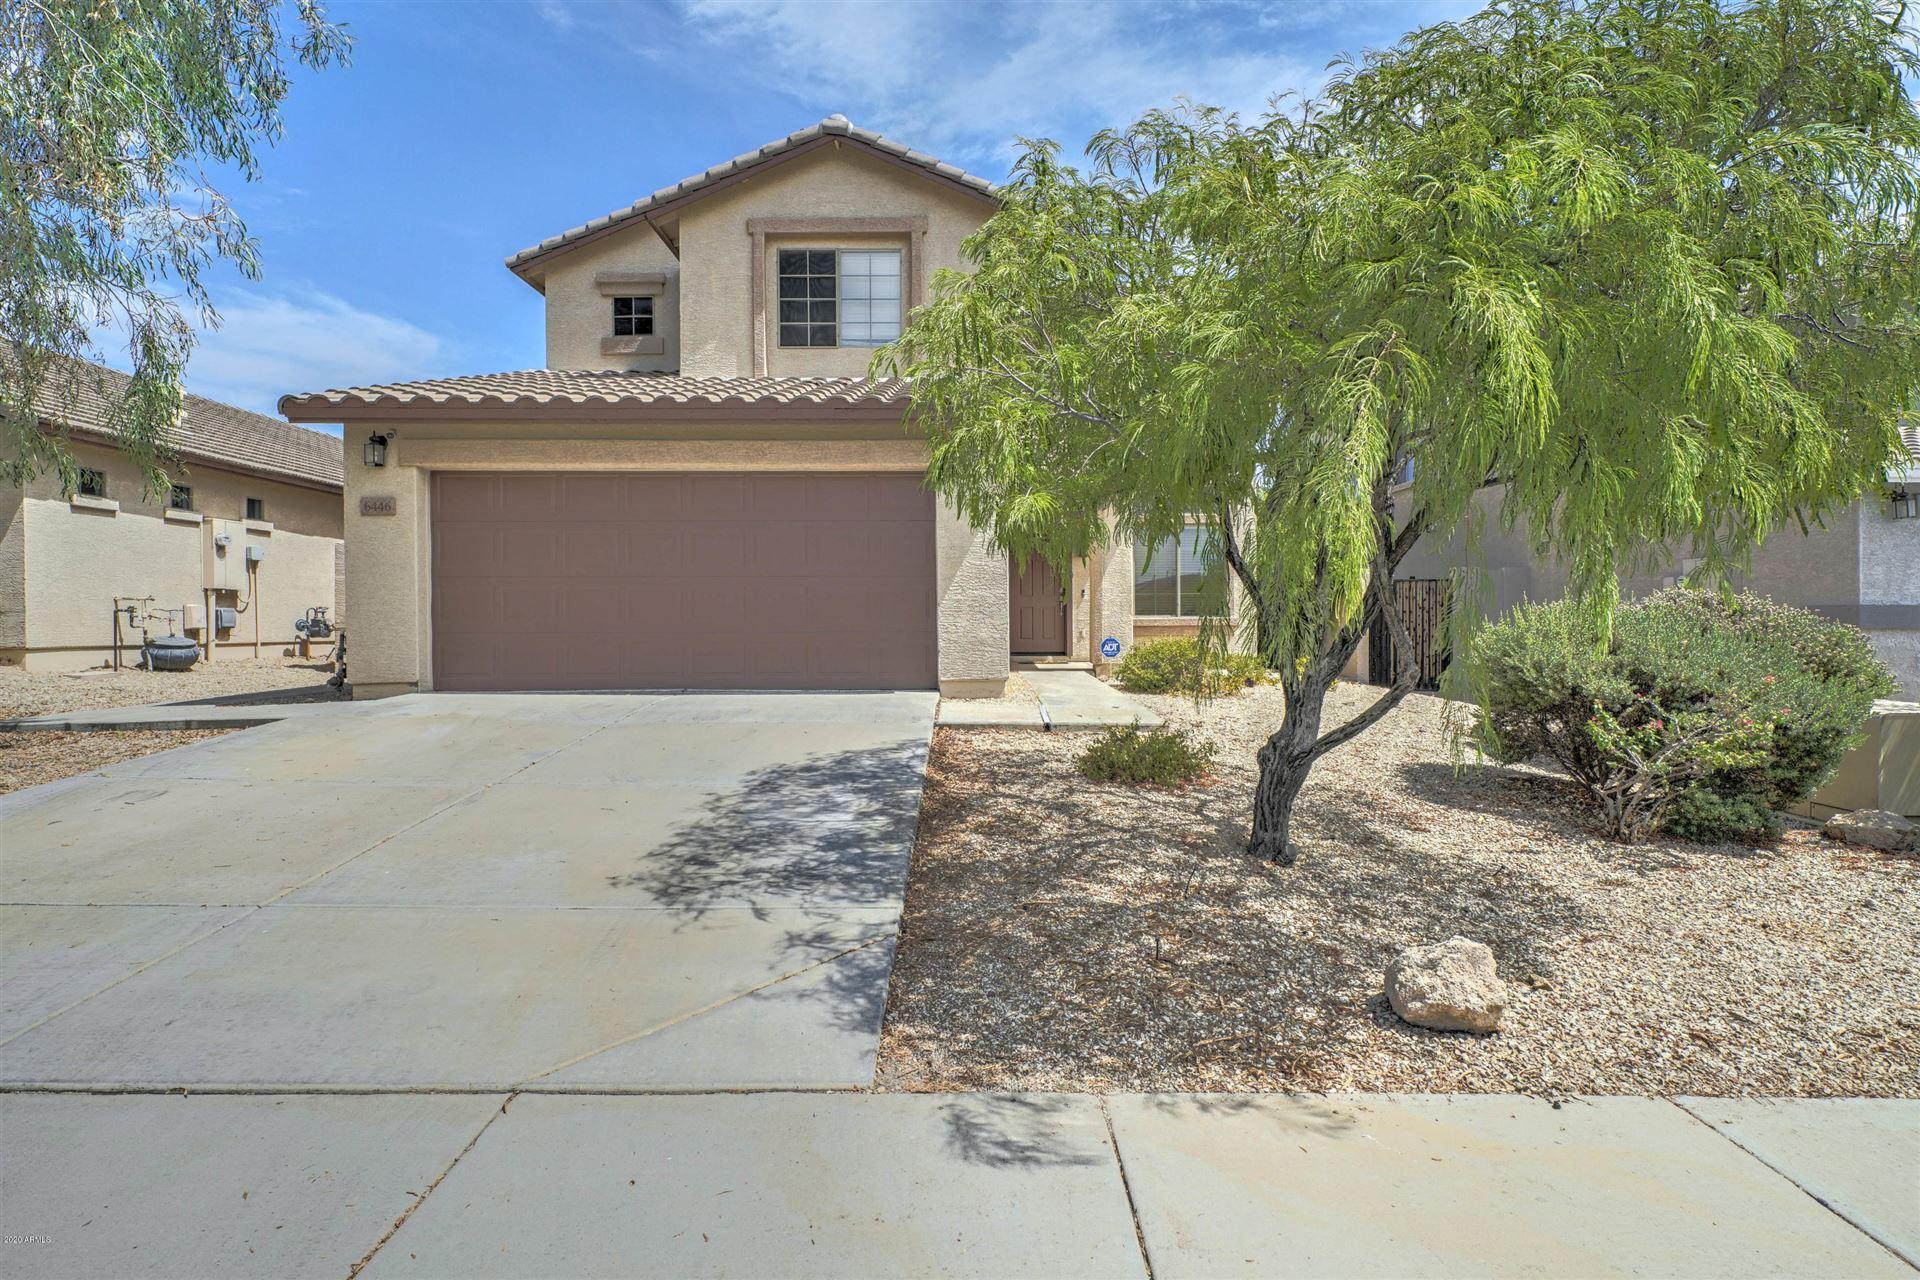 6446 W BLUE SKY Drive, Phoenix, AZ 85083 - #: 6103475